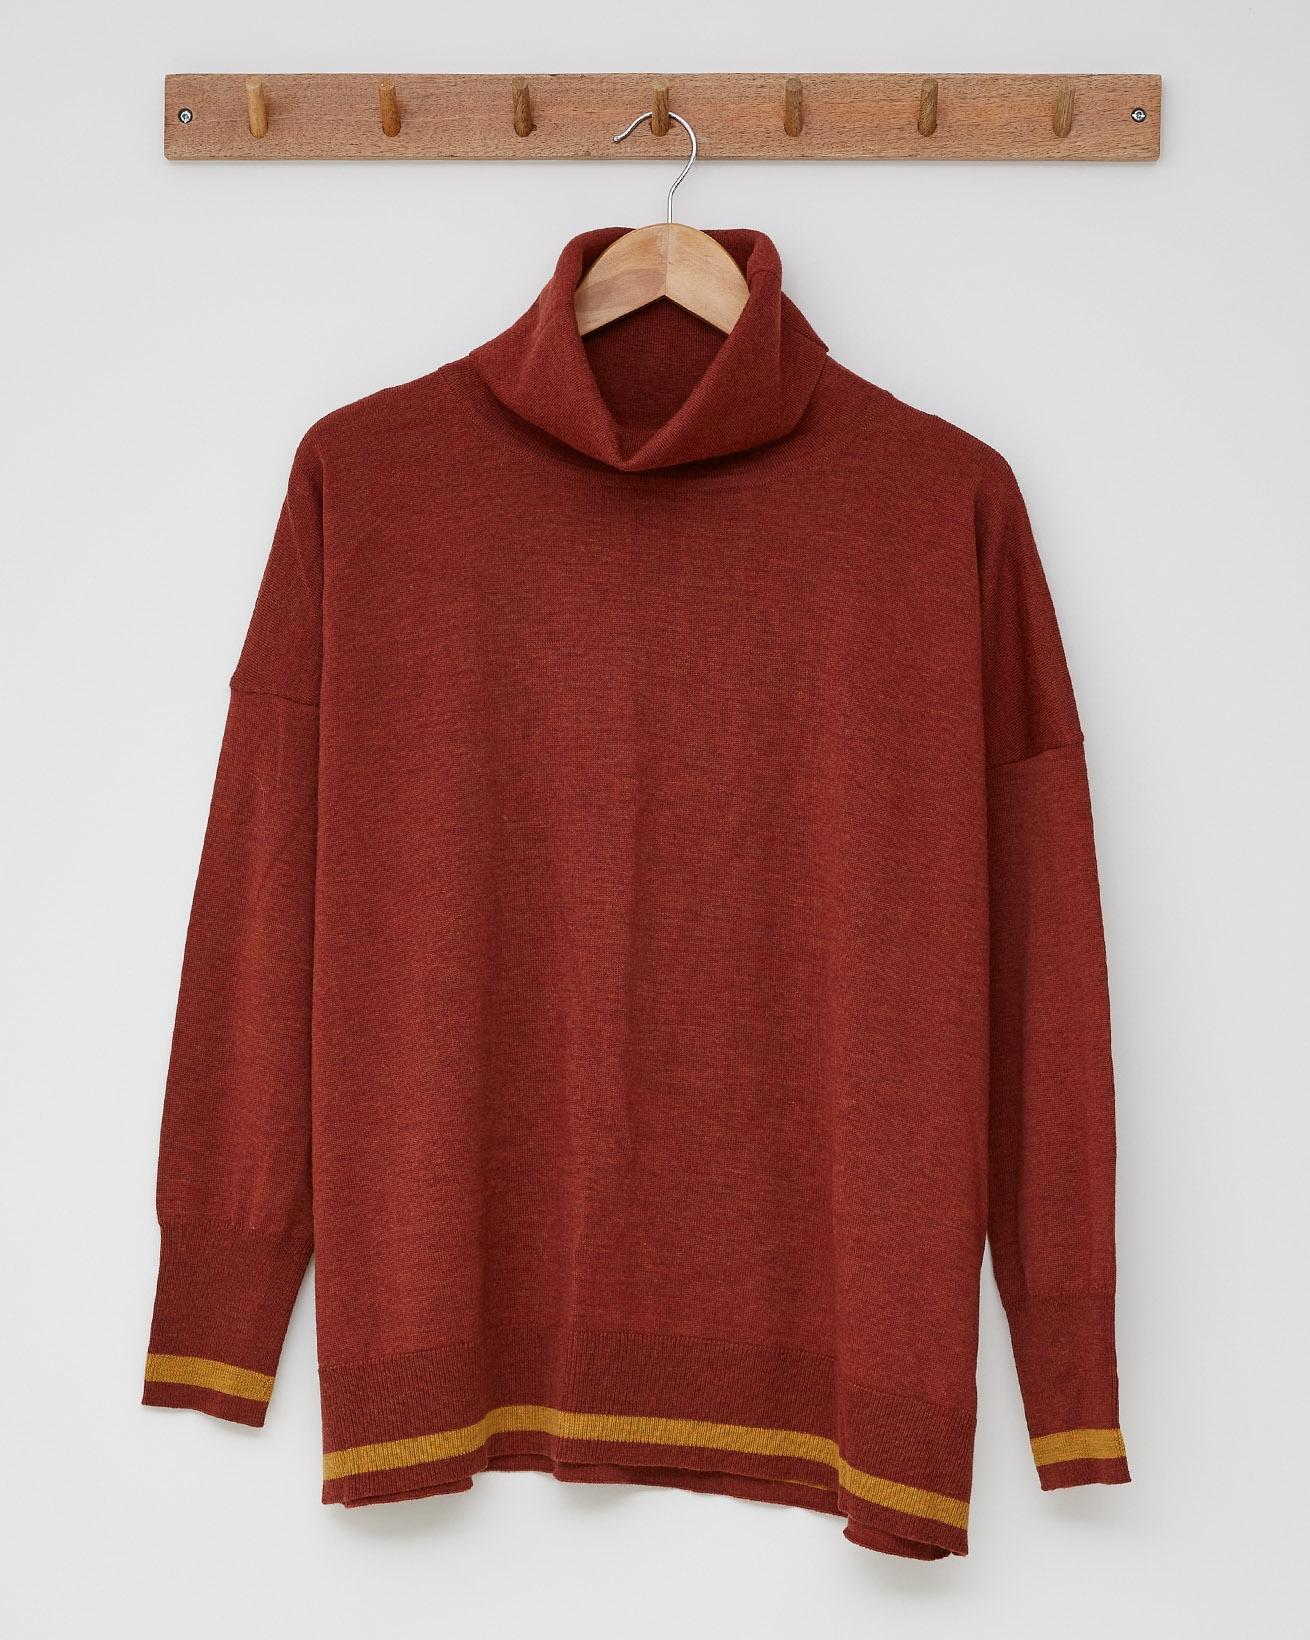 Slouchy Fine Knit Roll Neck Jumper - Size Small - Rust, Gorse Stripe - 2457